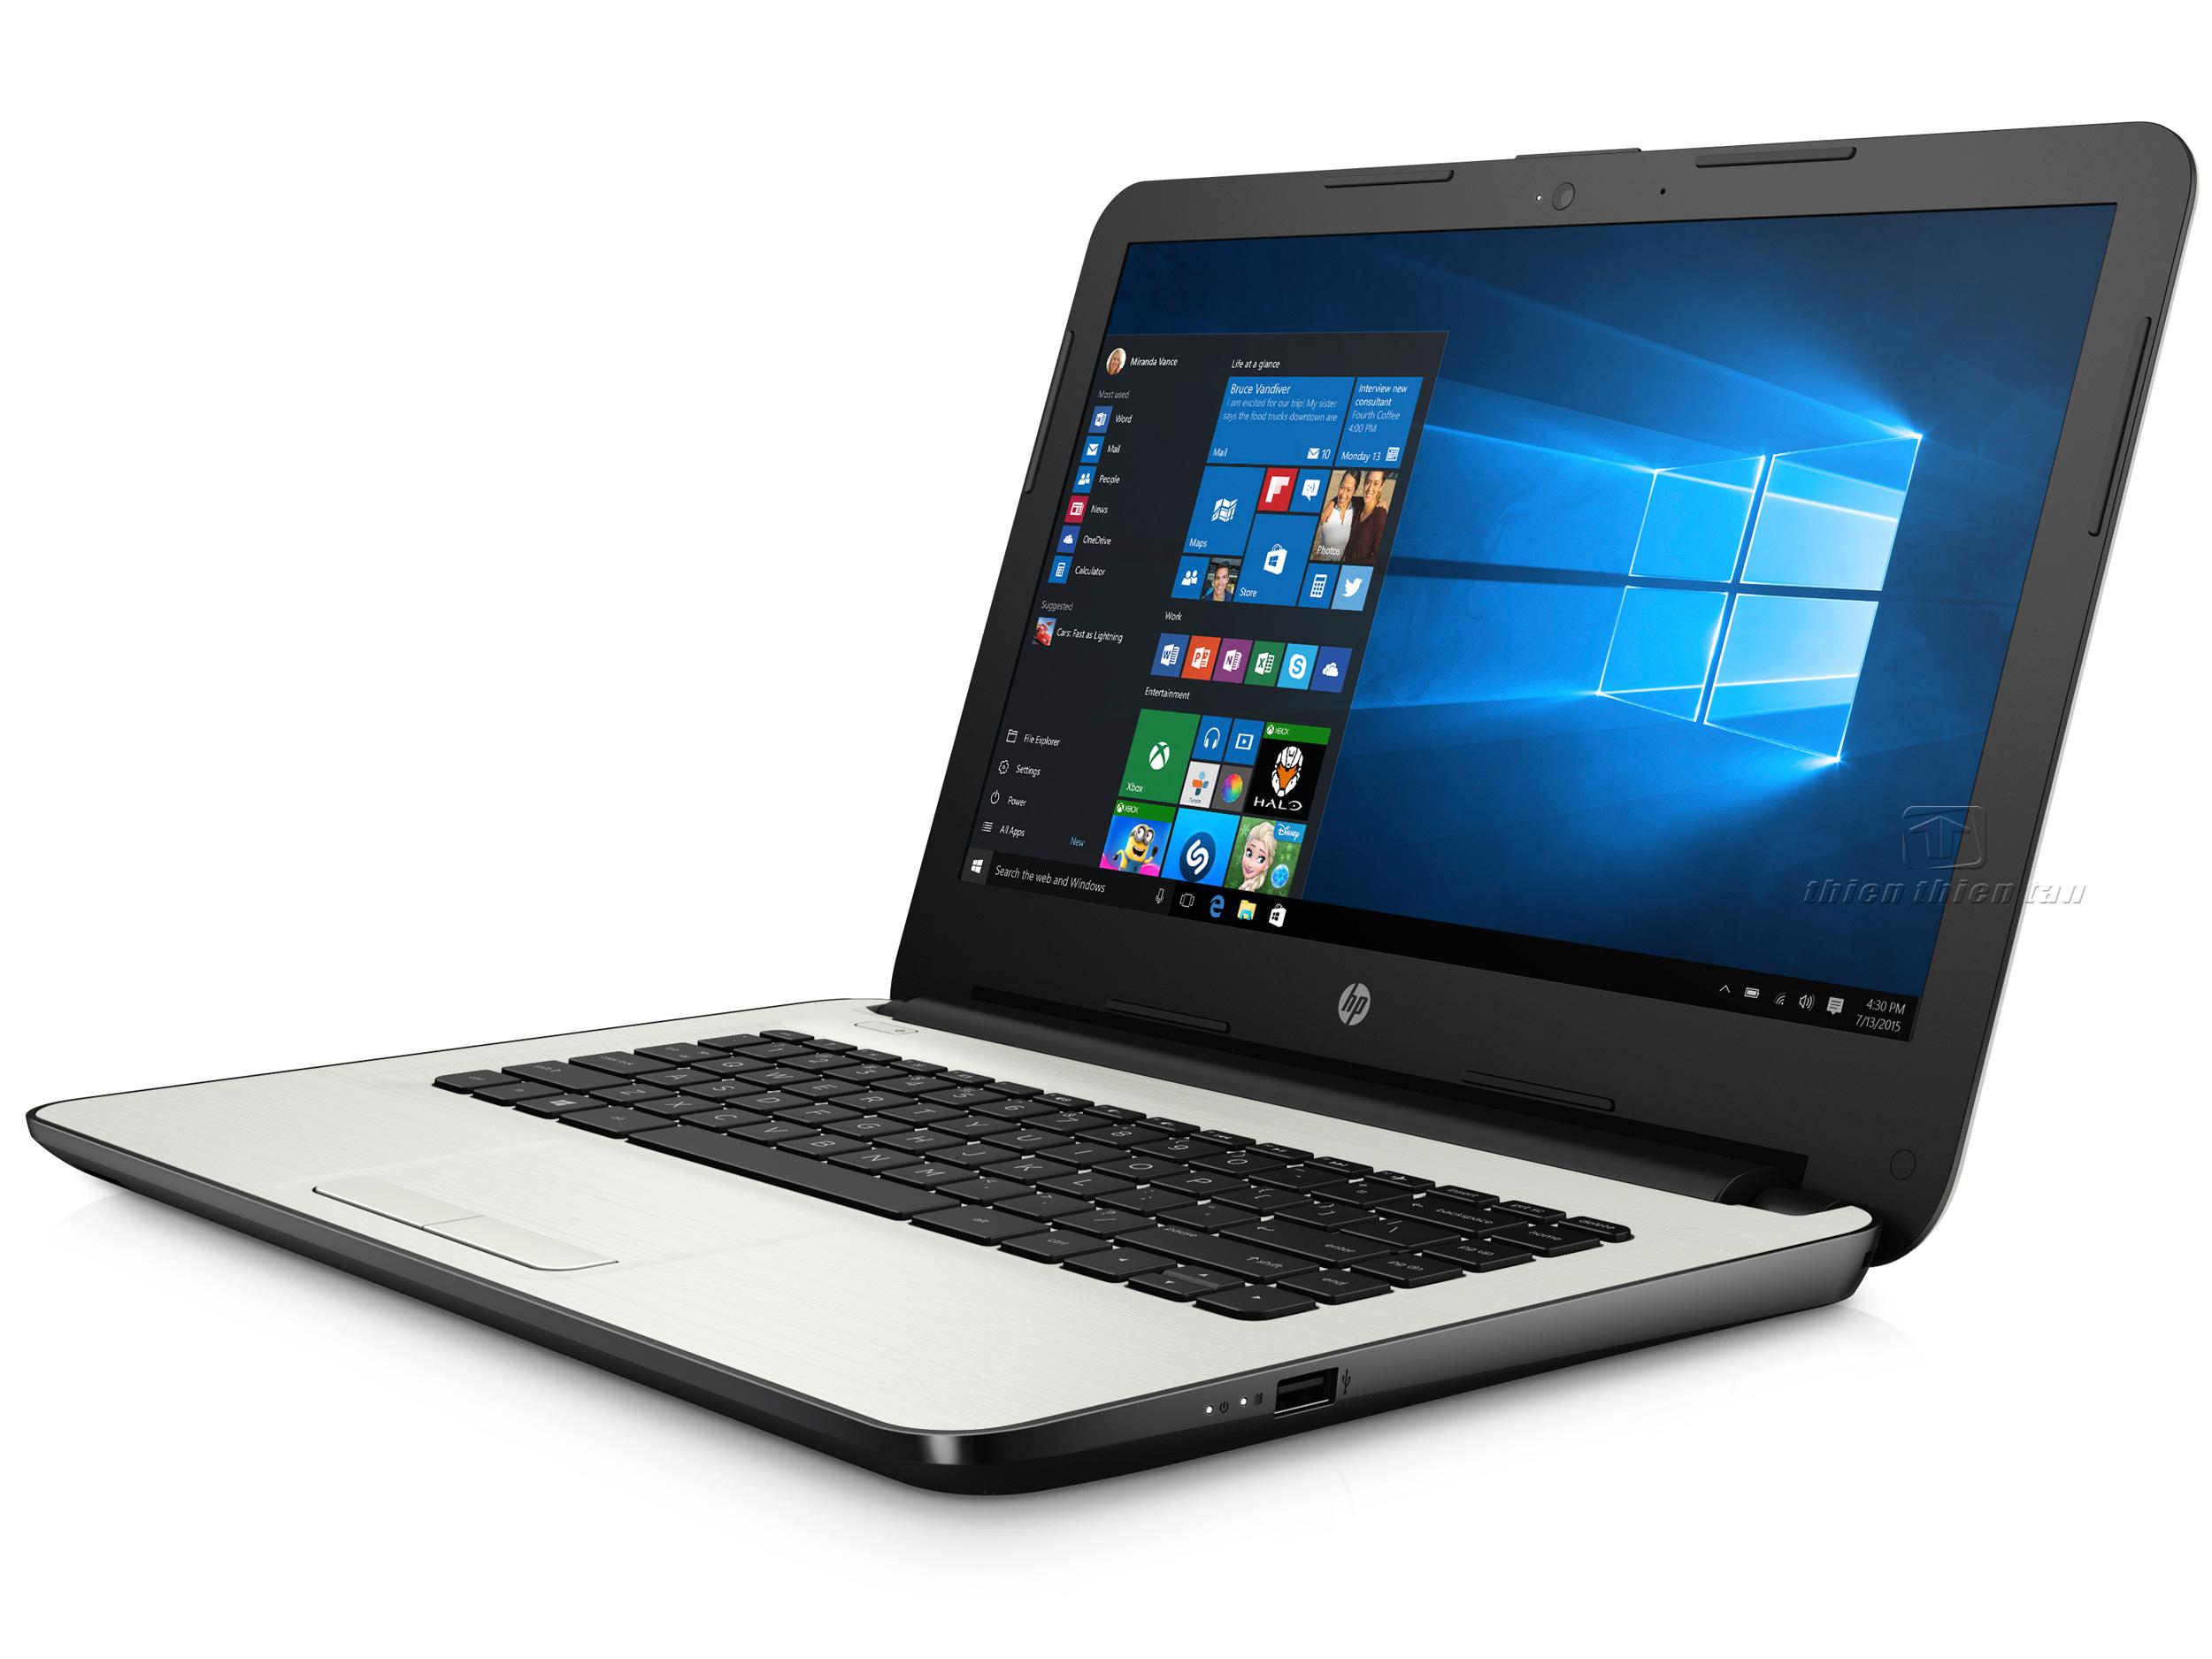 Laptop HP Core i5 14-am056TU X1H03PA (Silver)